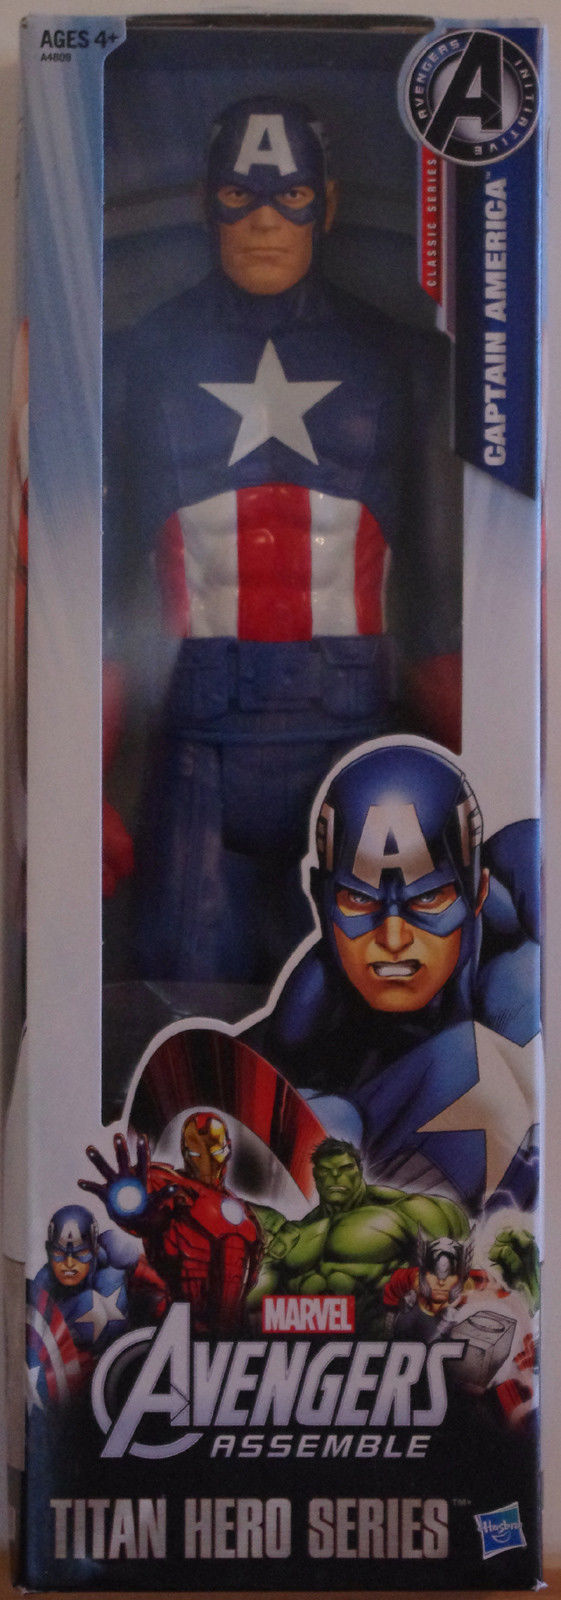 CAPTAIN AMERICA Action Figure, Titan Hero Series, 2012, Marvel, more AF in store